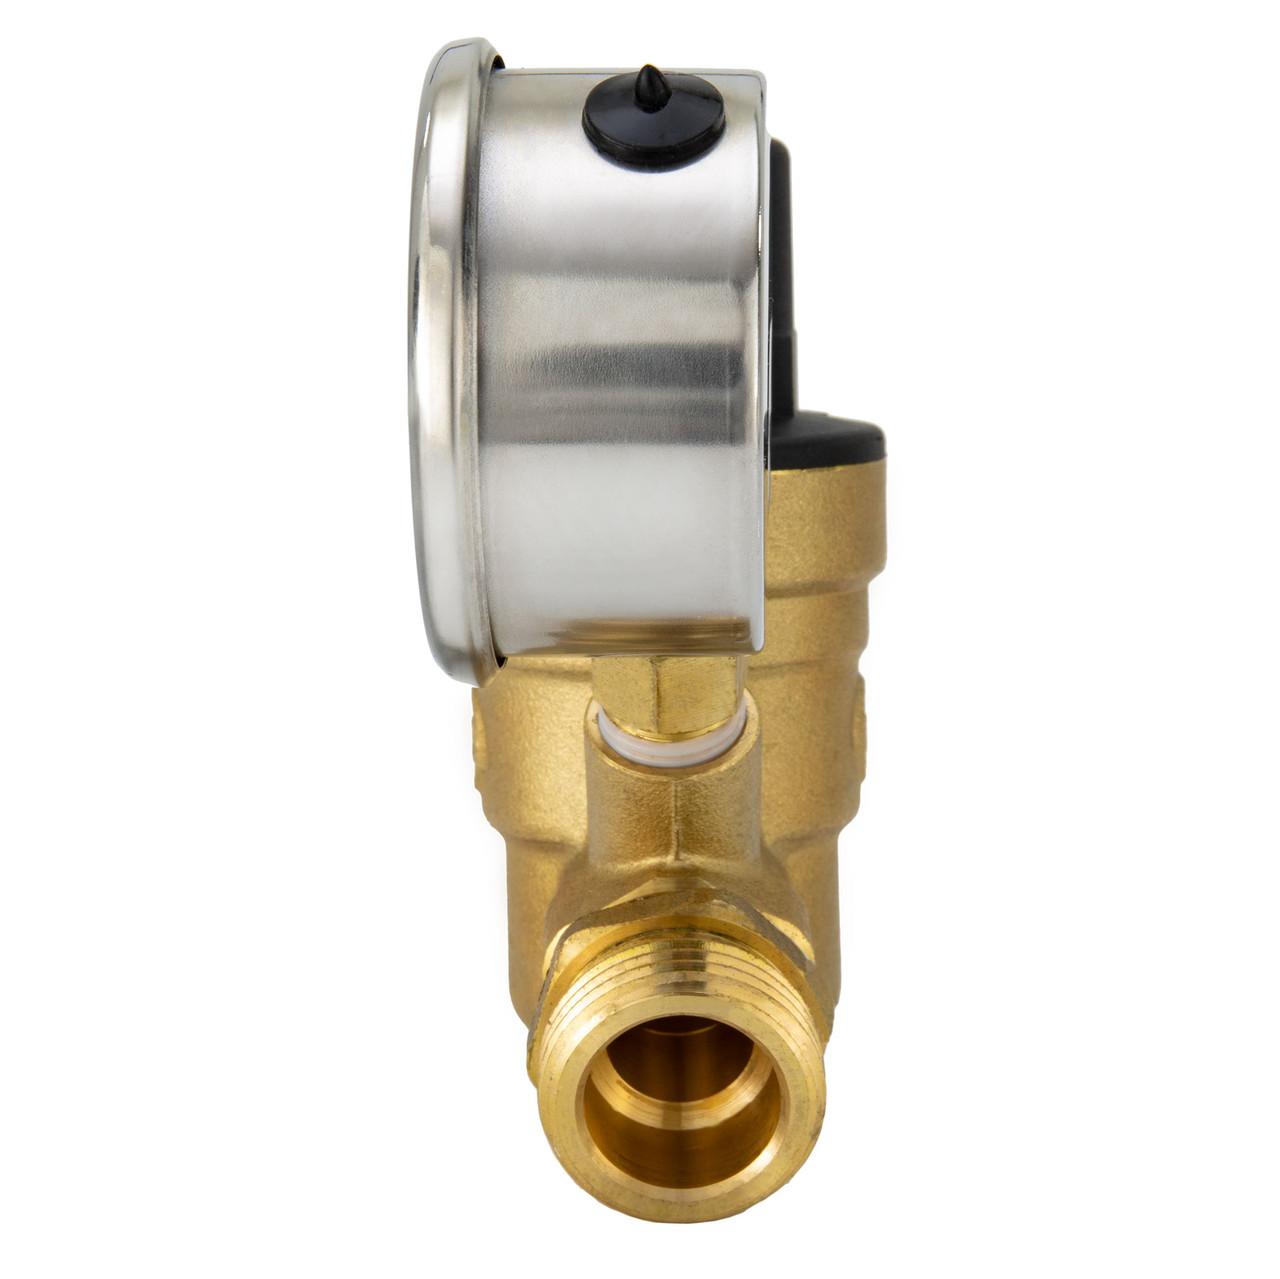 Rv Brass Water Pressure Regulator With Gauge Recpro